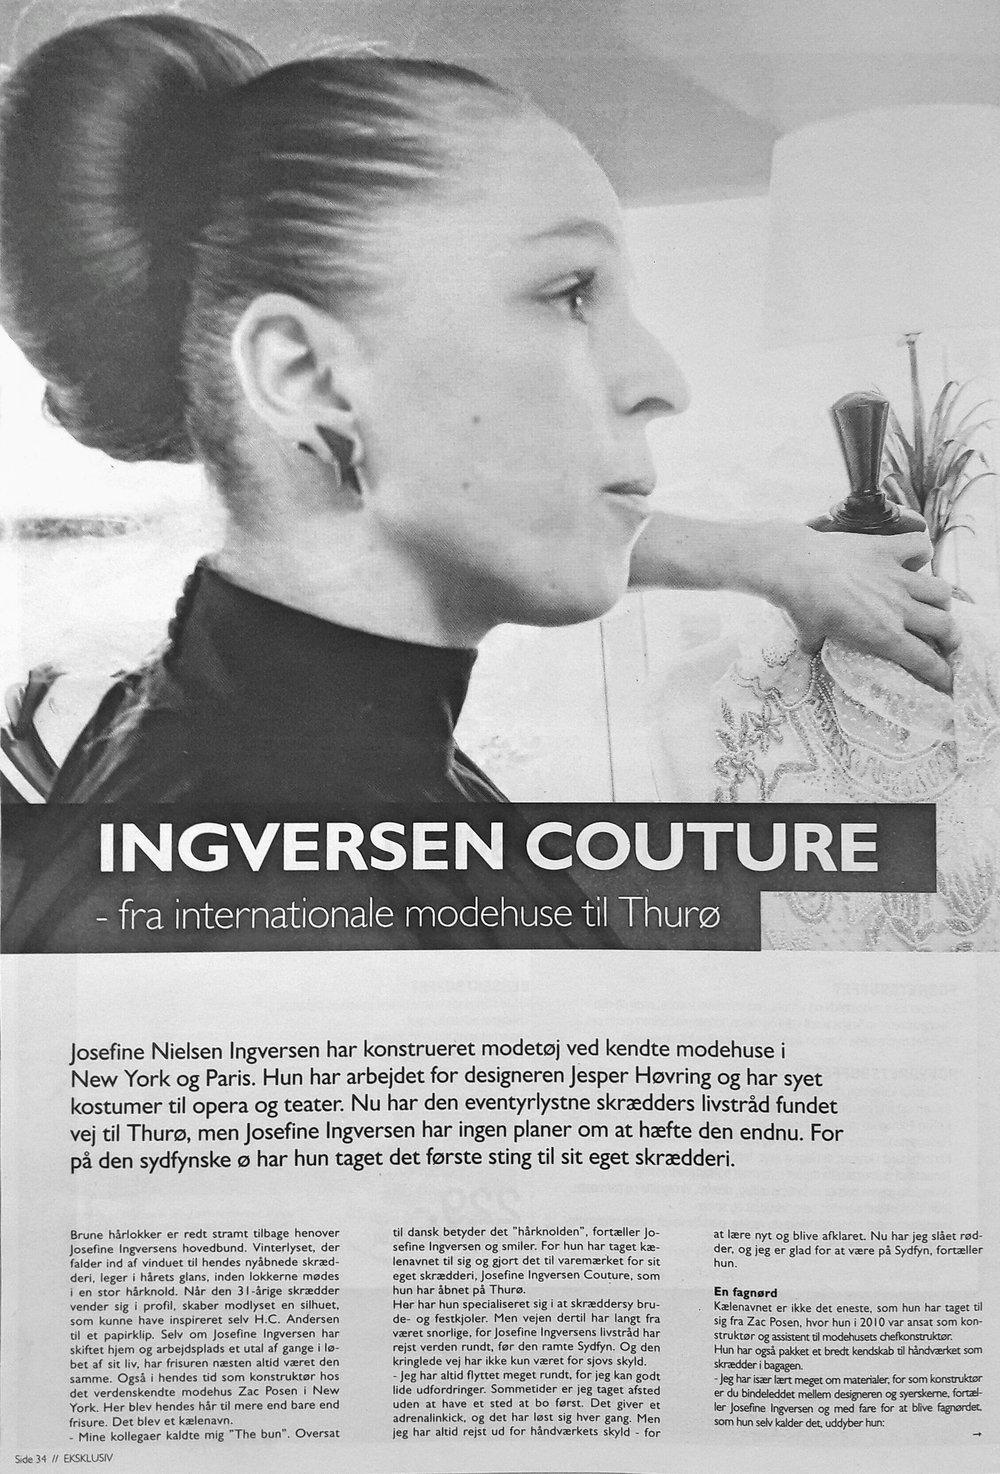 Eksklusiv // Ingversen Couture // Fyens Stifttidende & Fyens Amts Avis // 25. marts 2017